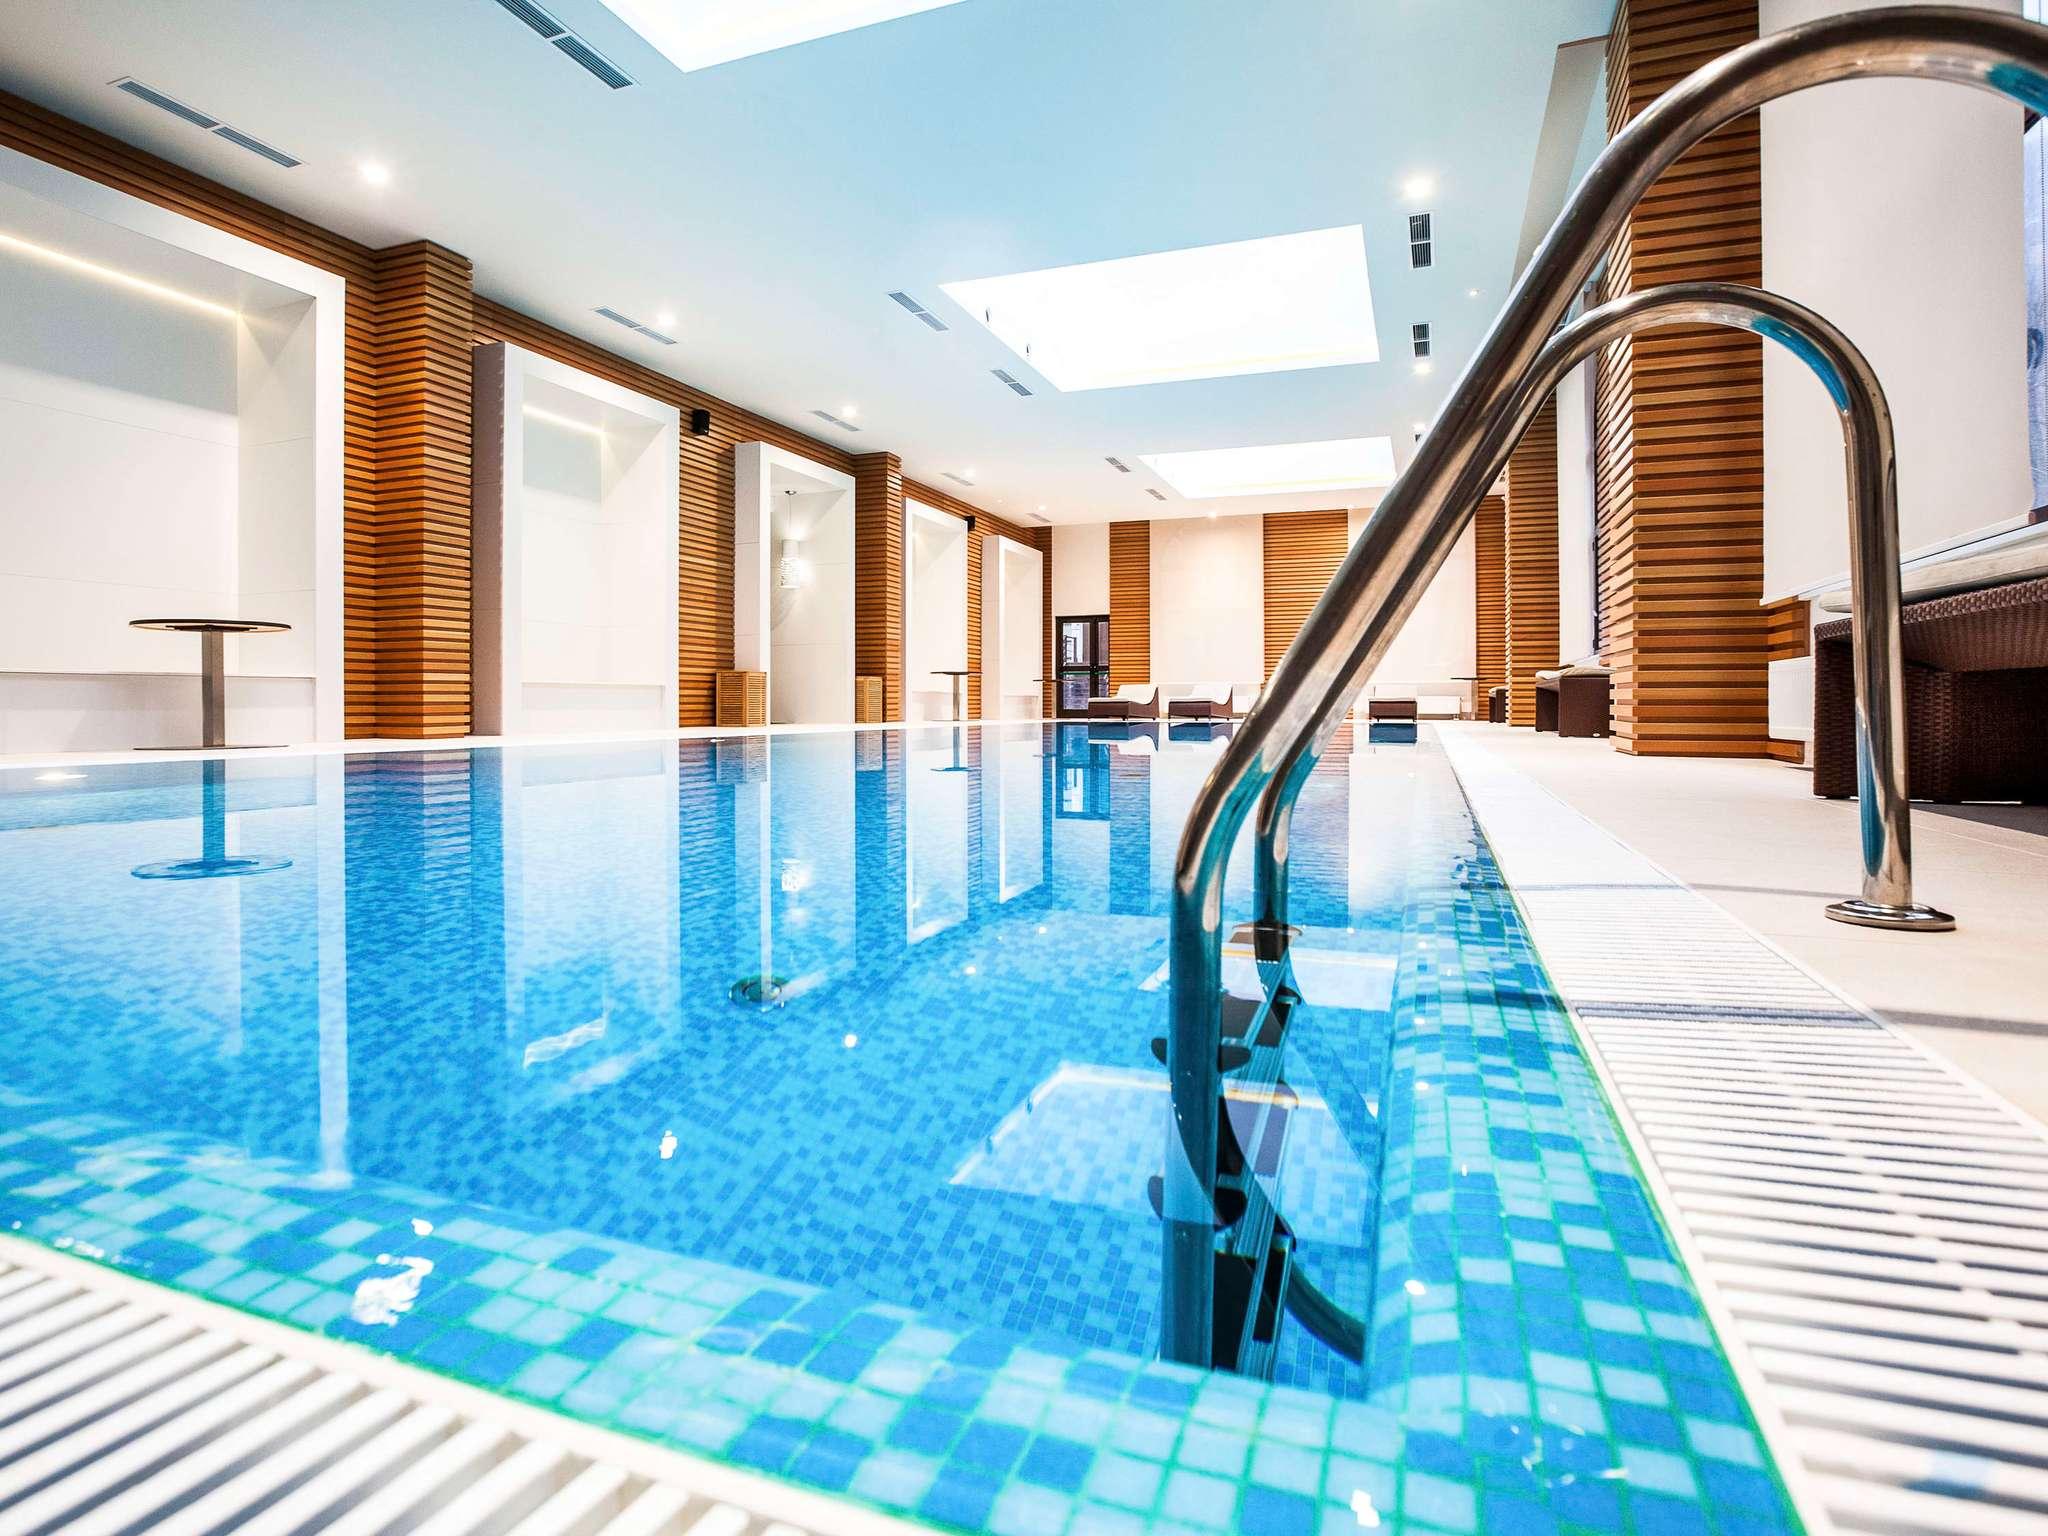 Hotell – Mercure Rosa Khutor Hotel